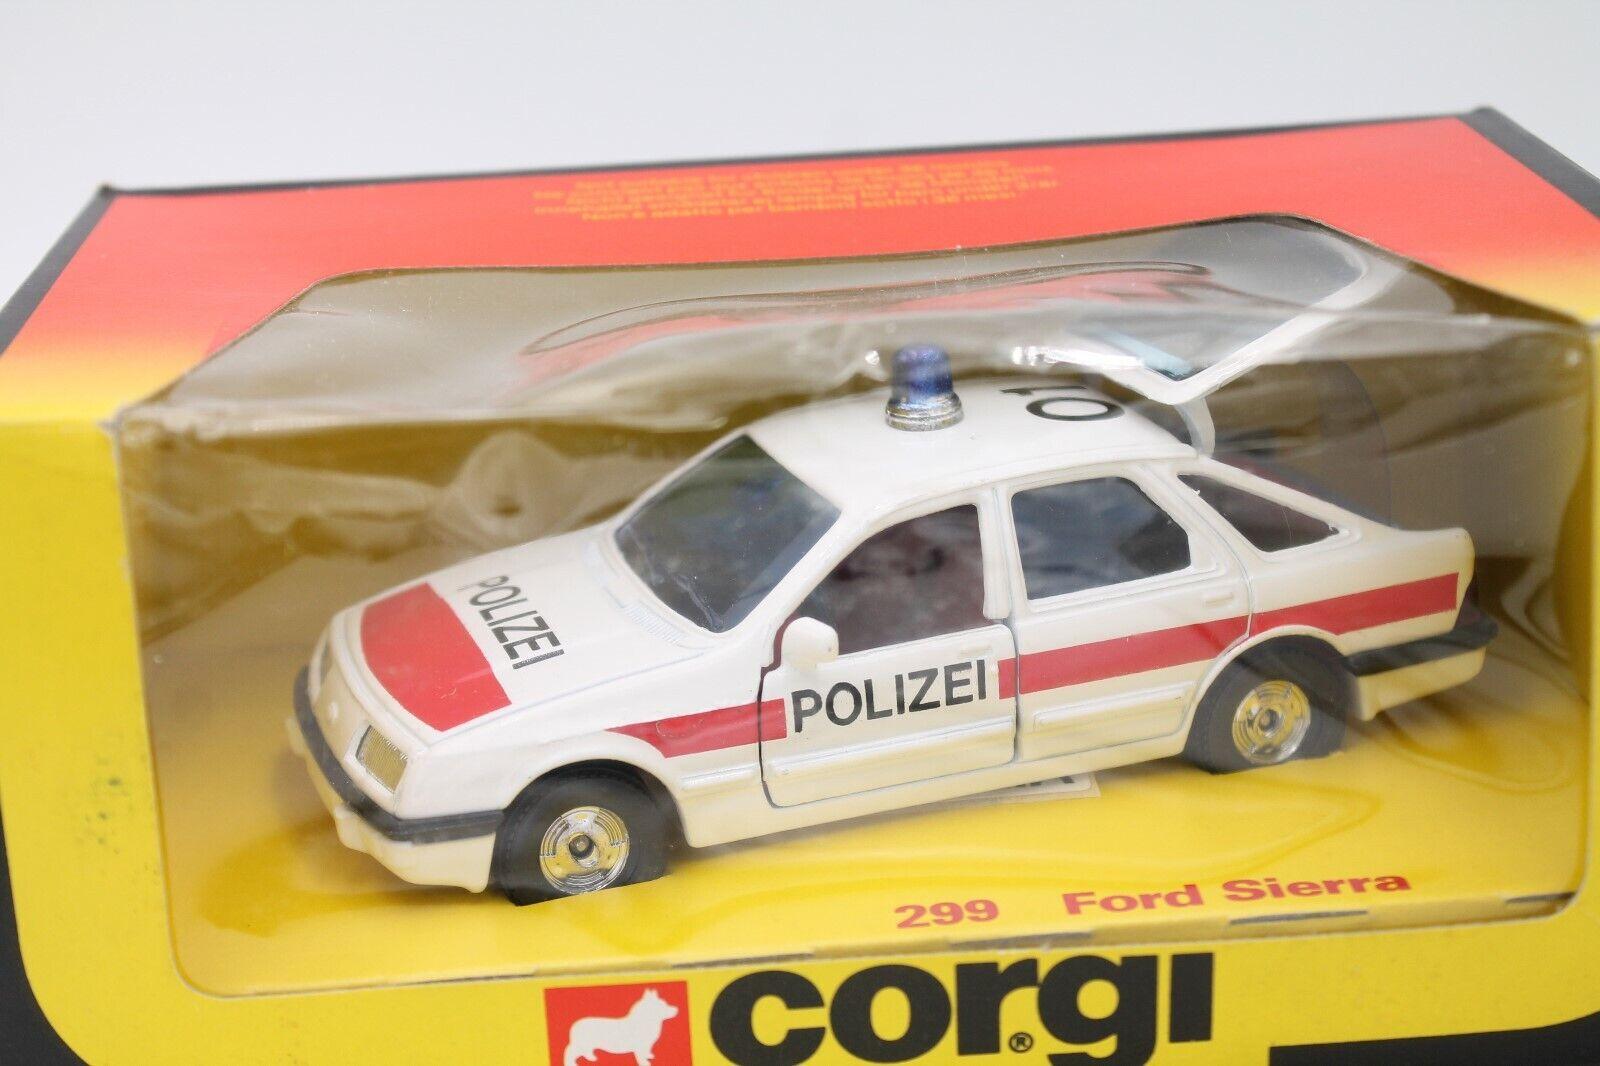 Corgi Juguetes 299  ford sierra policía  1 36  embalaje original  1983